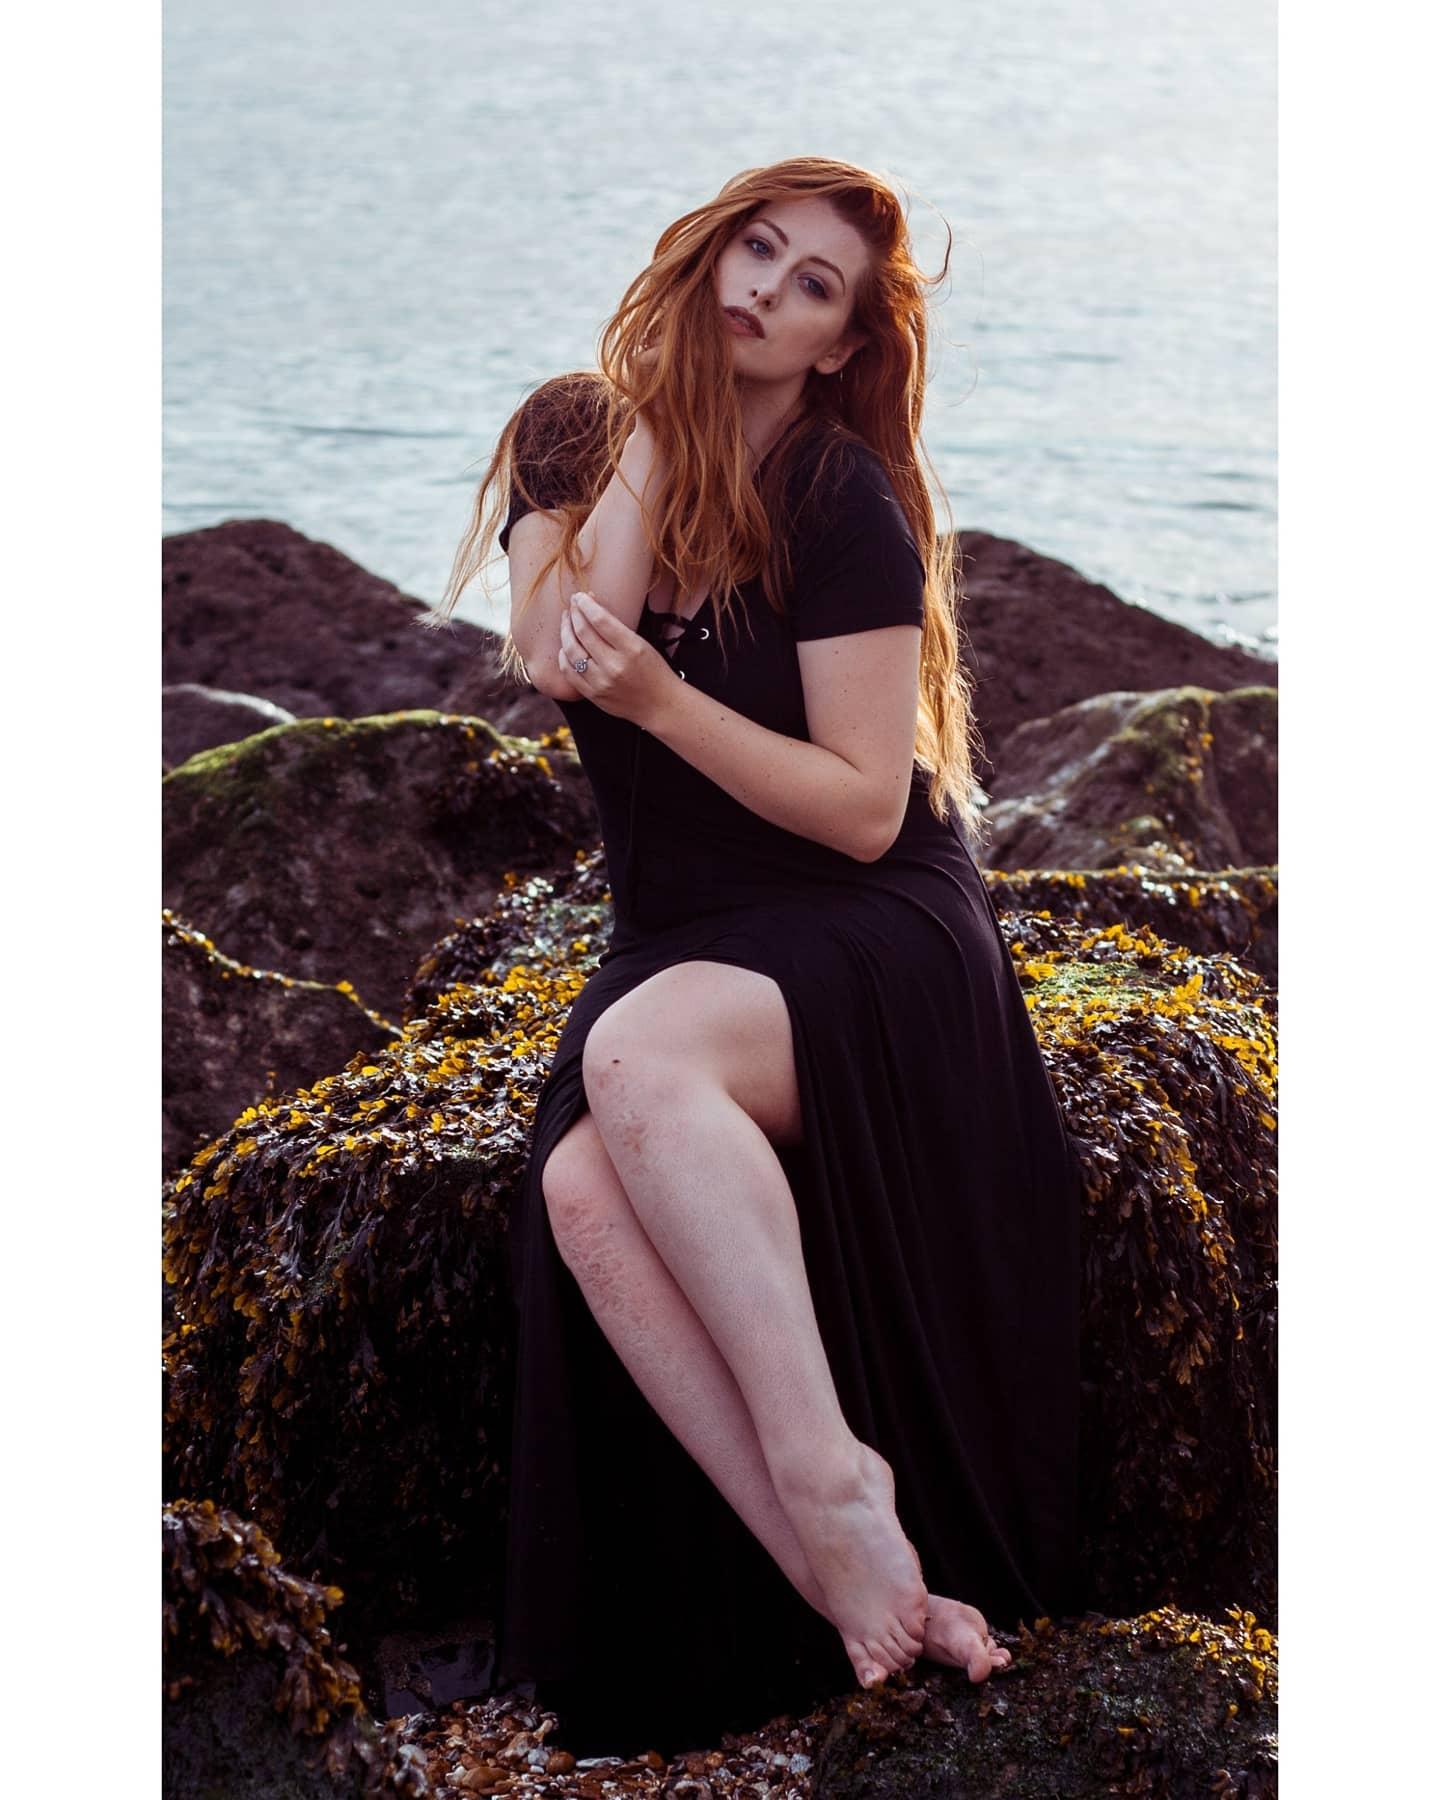 sunnyday redhead beachshoot follow model modeling photo photooftheday photographer photography